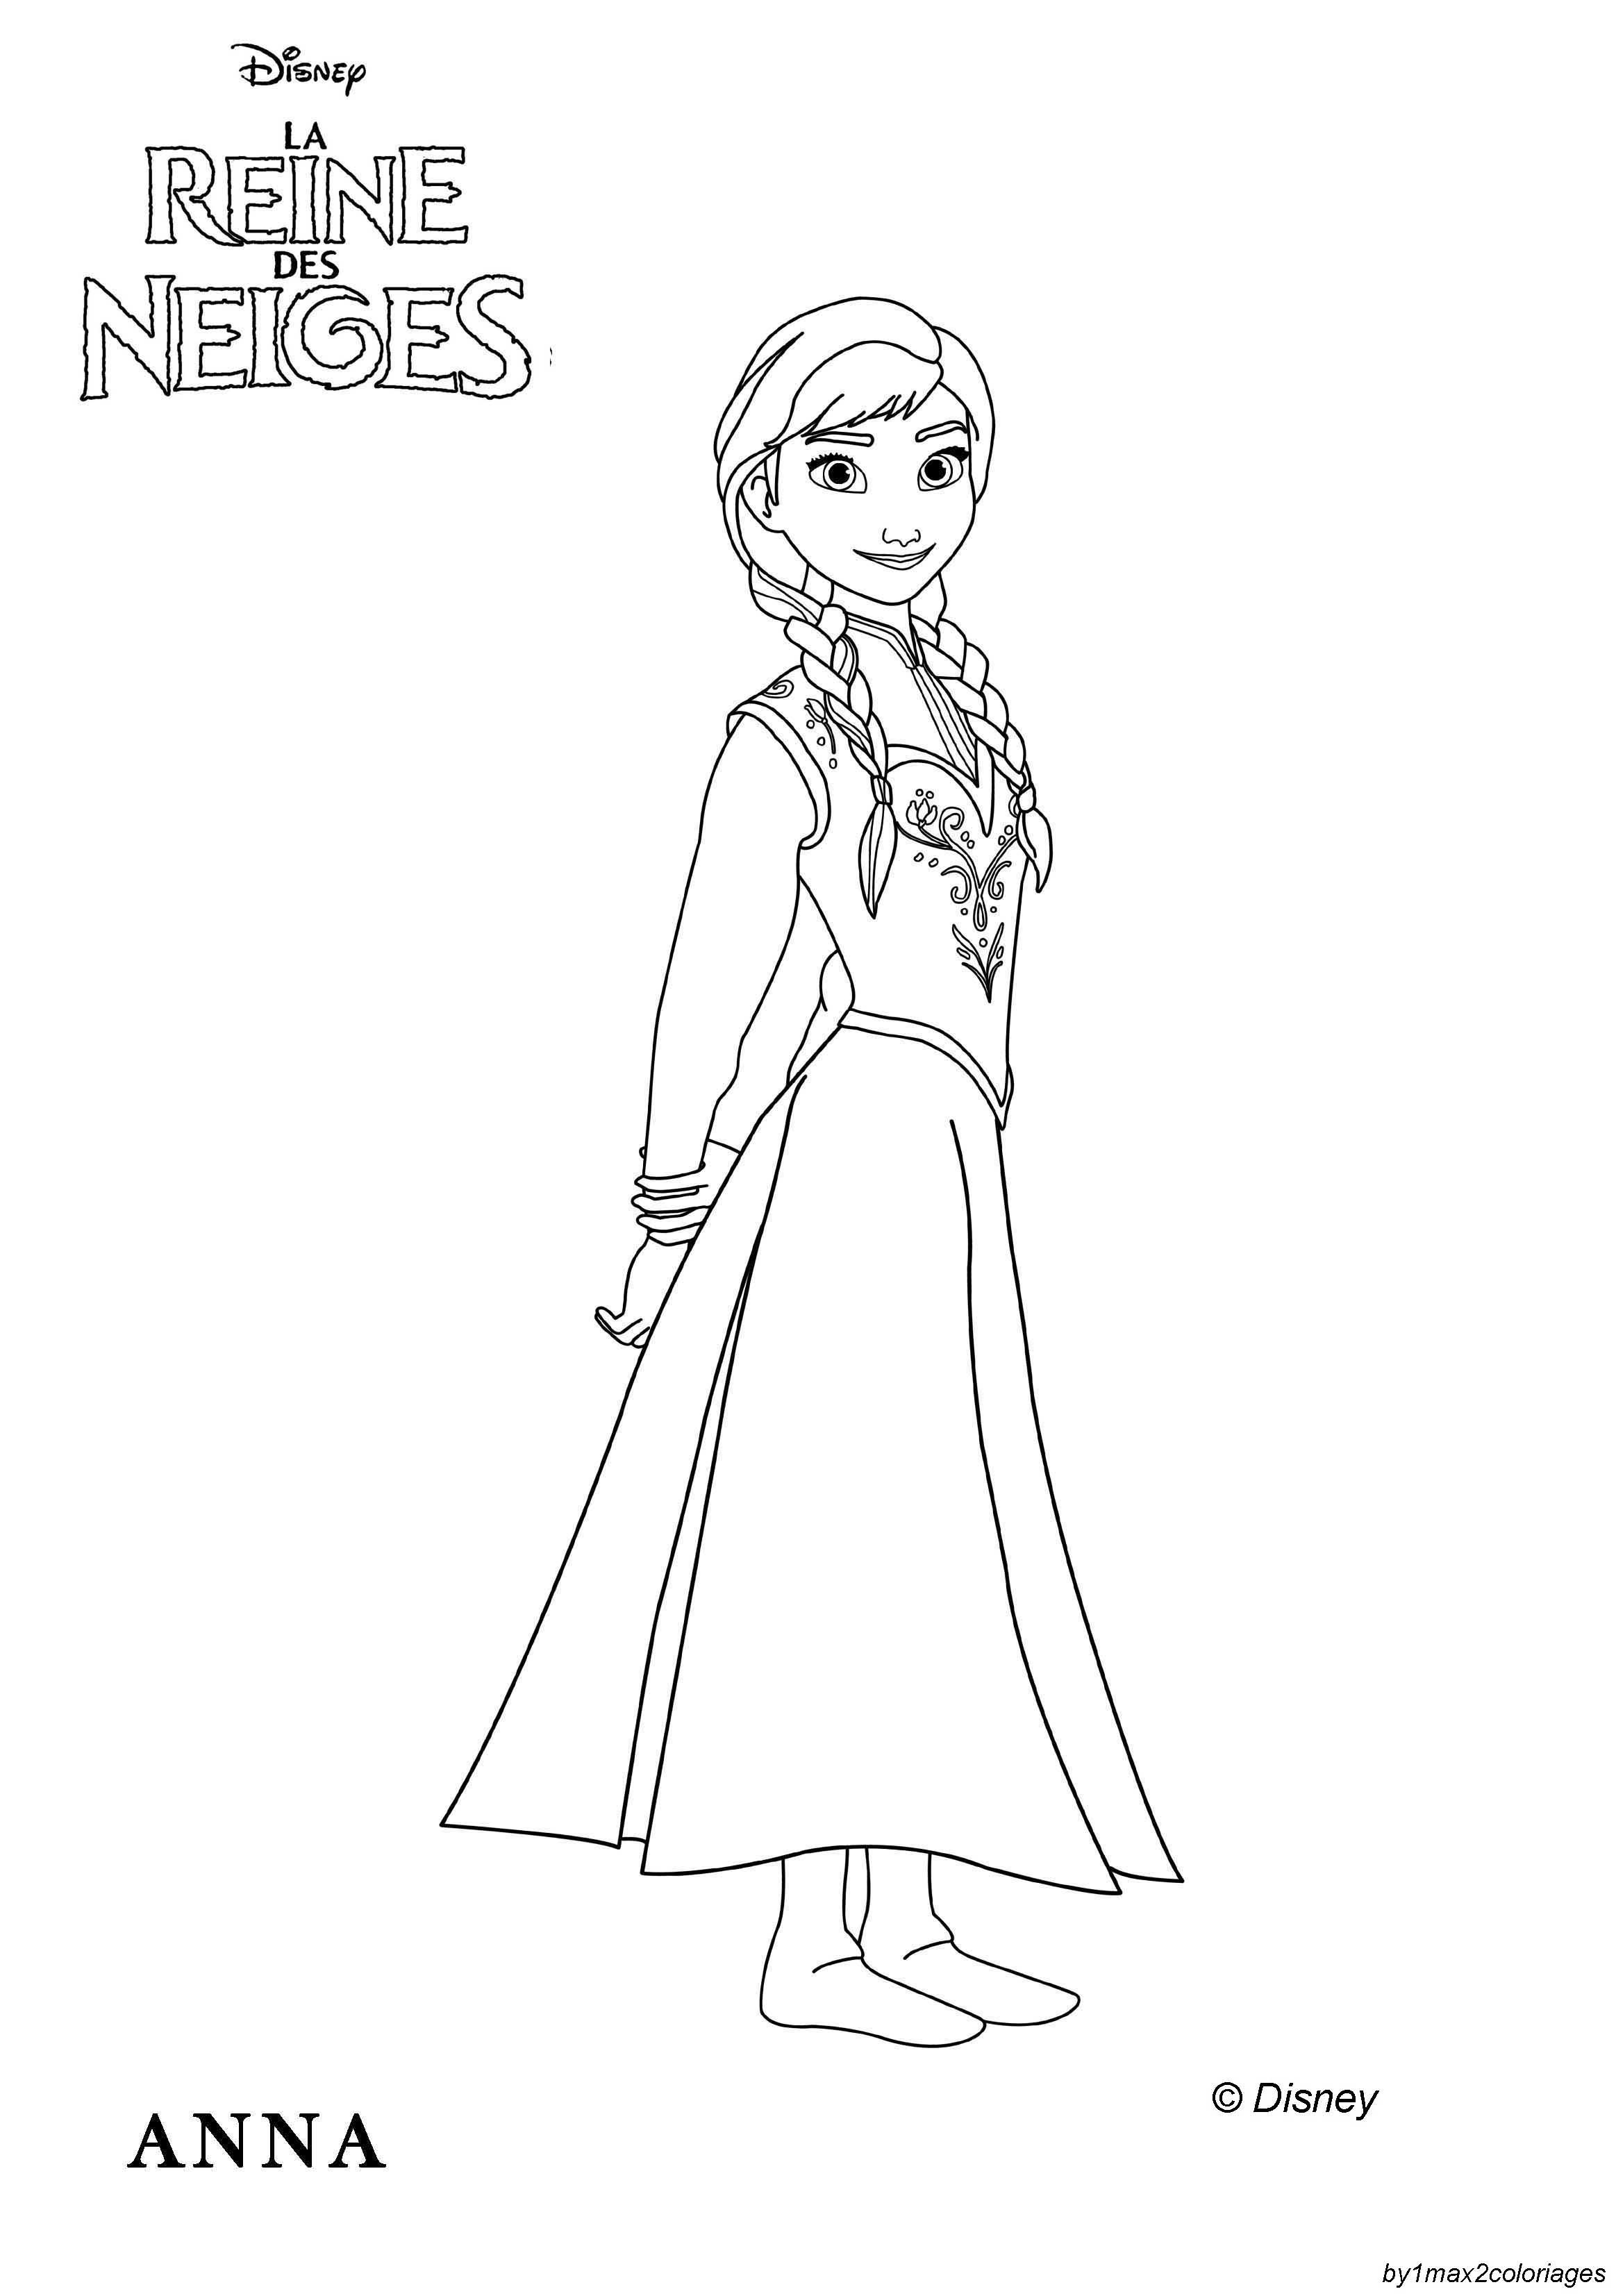 144 Dibujos De Disney Frozen Para Colorear Oh Kids Page 3e